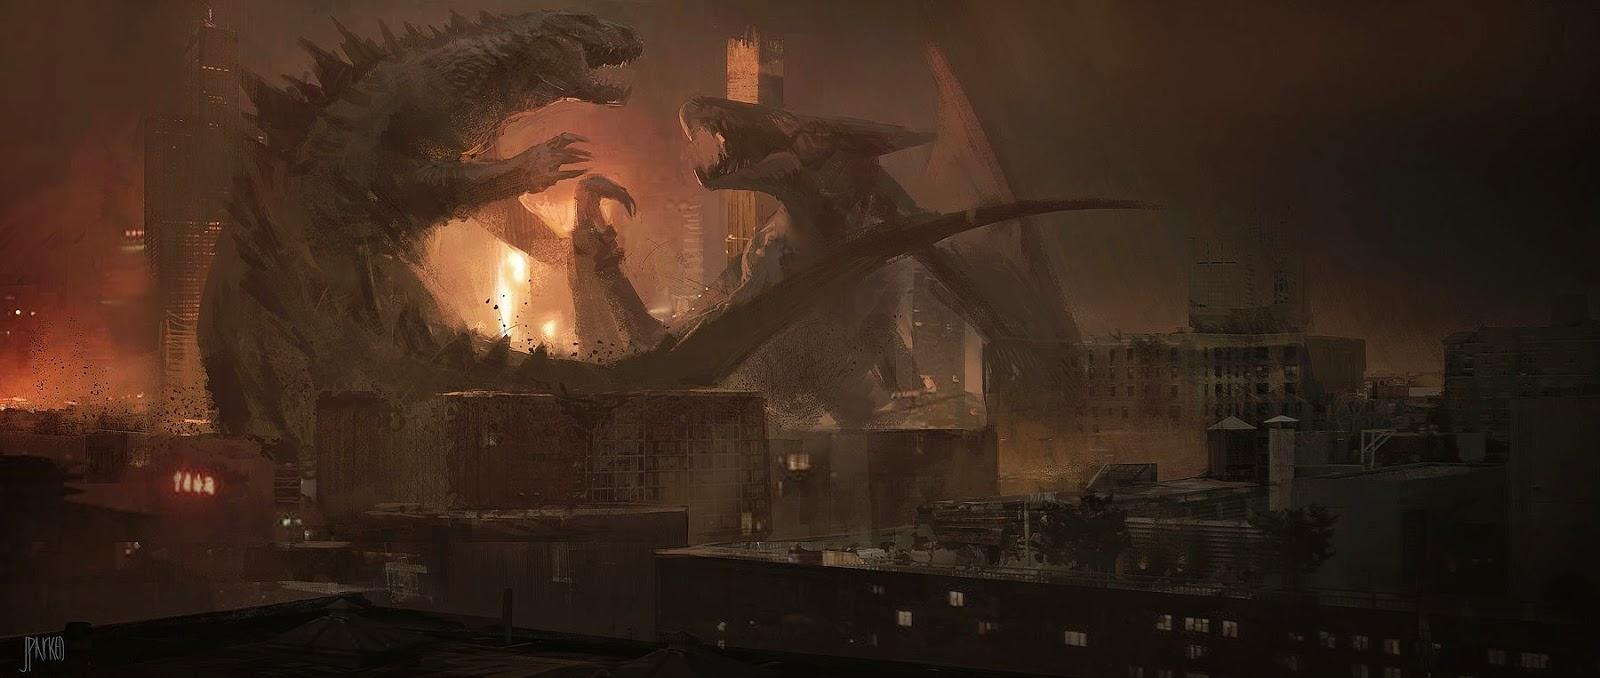 Godzilla Concept Art by John Park (2 pics)